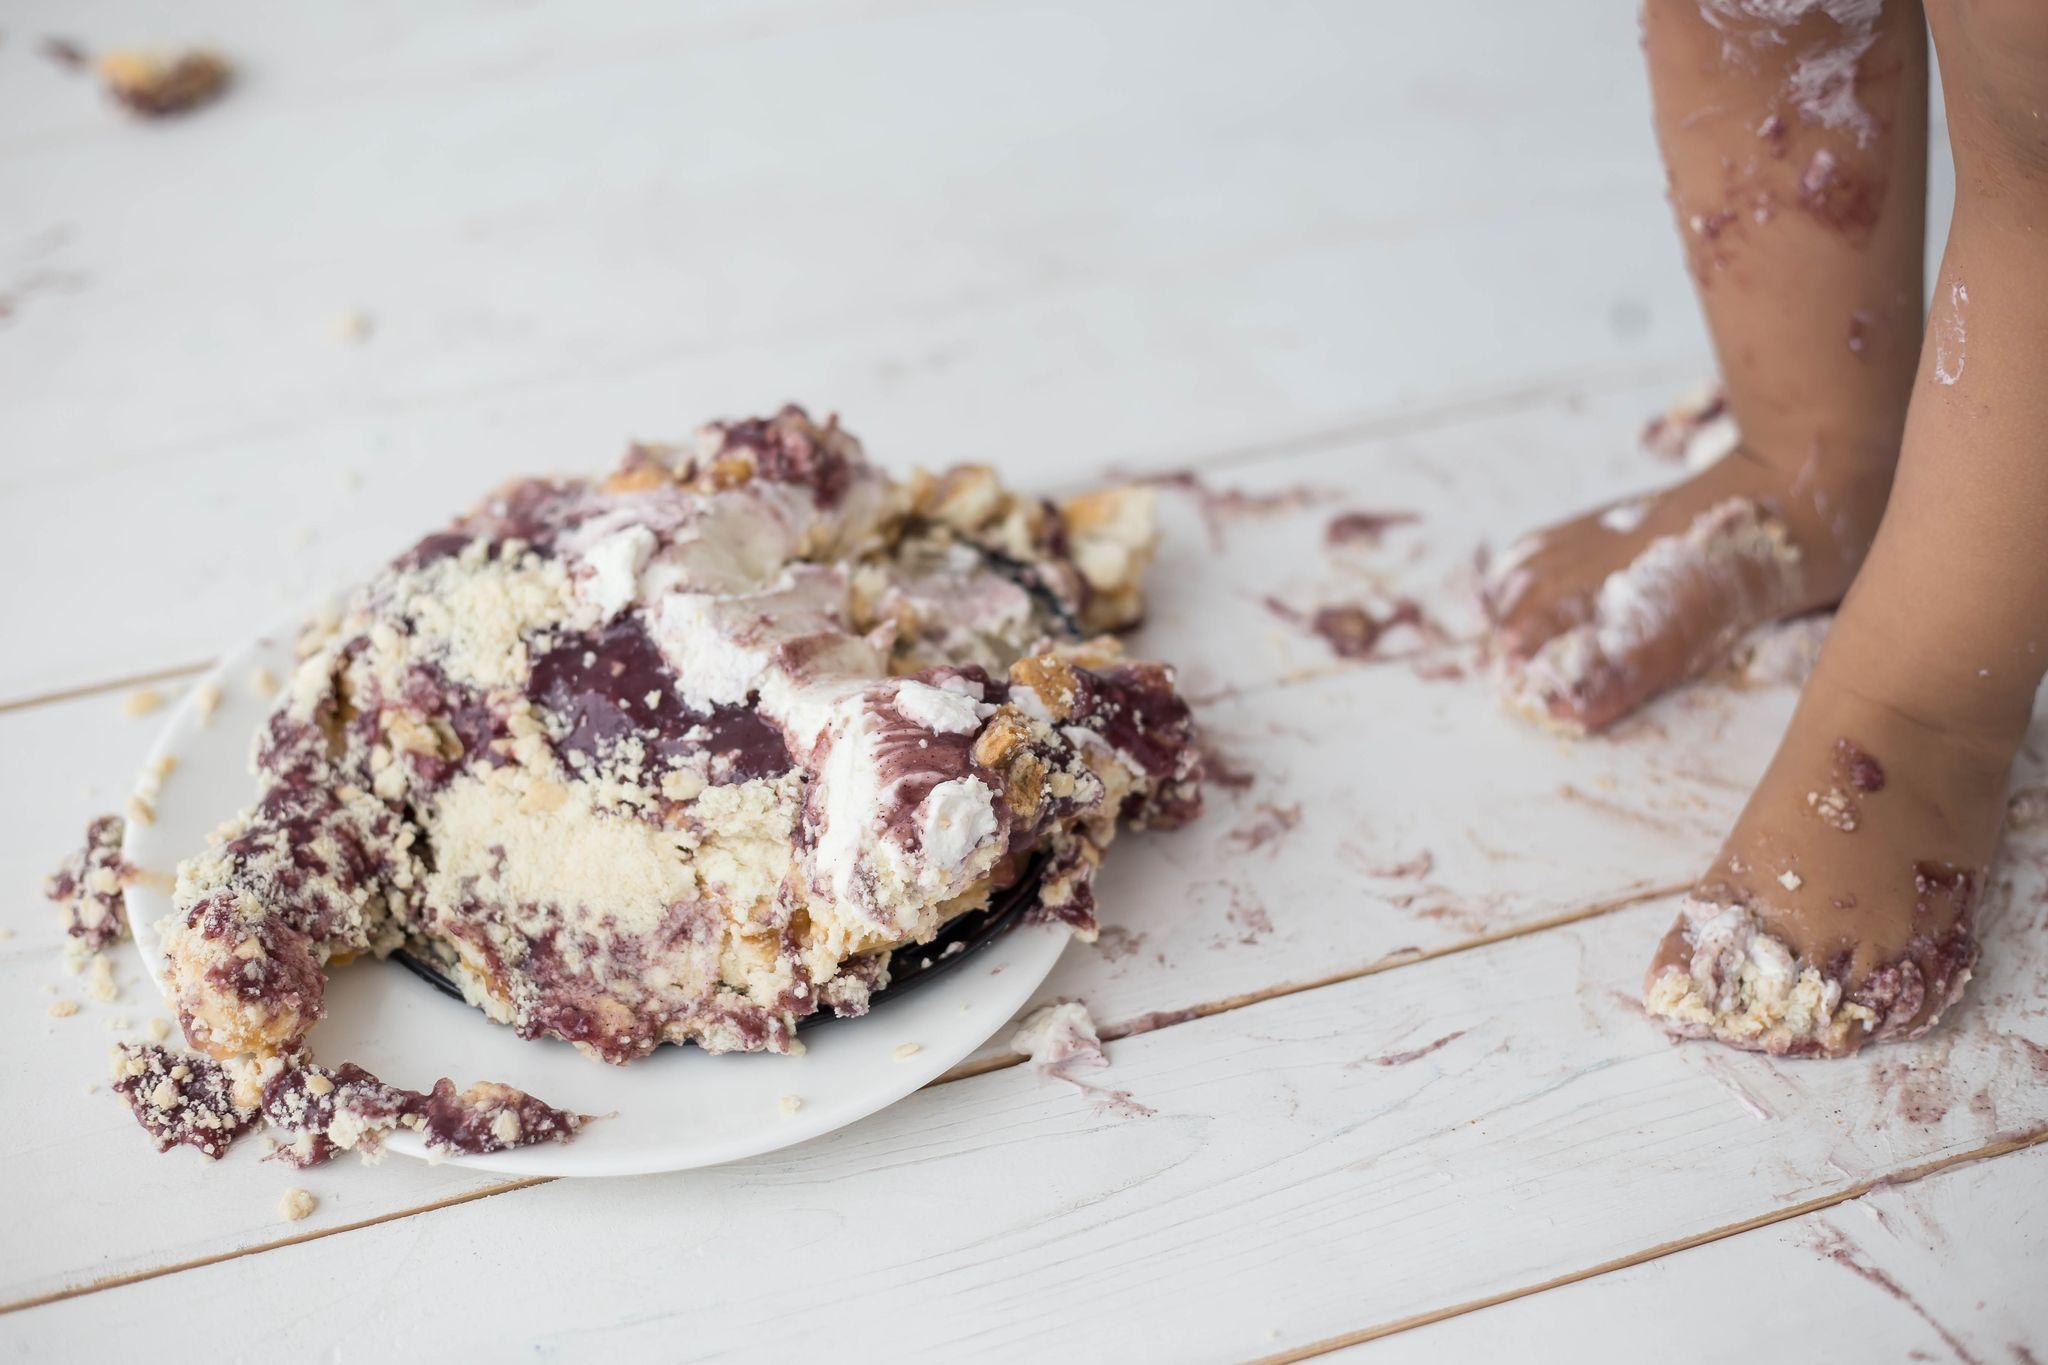 Cake Smash erster Geburtstag Fotoshooting